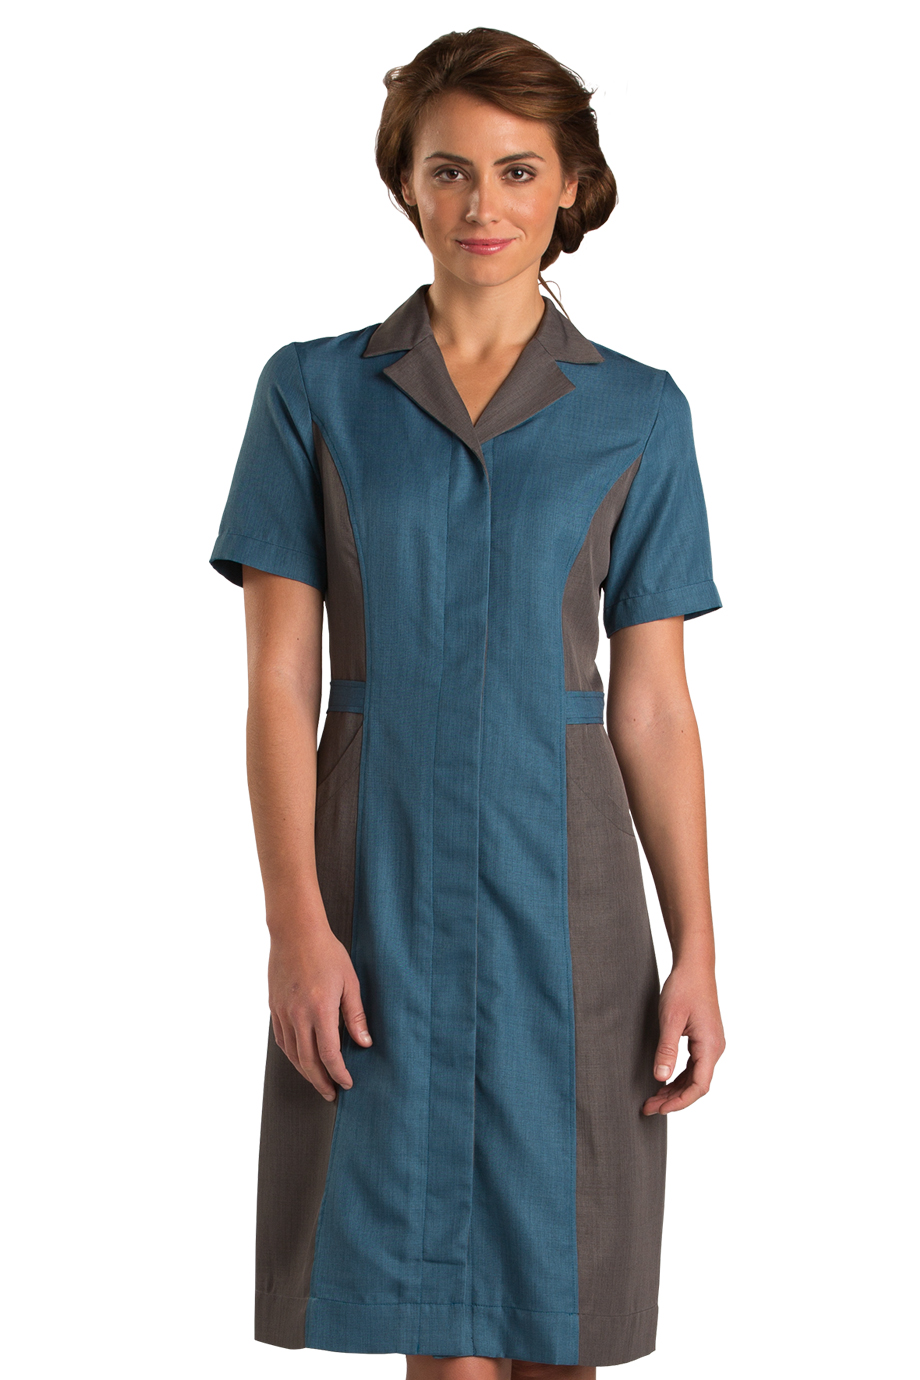 Ladies' Premier Dress 9891